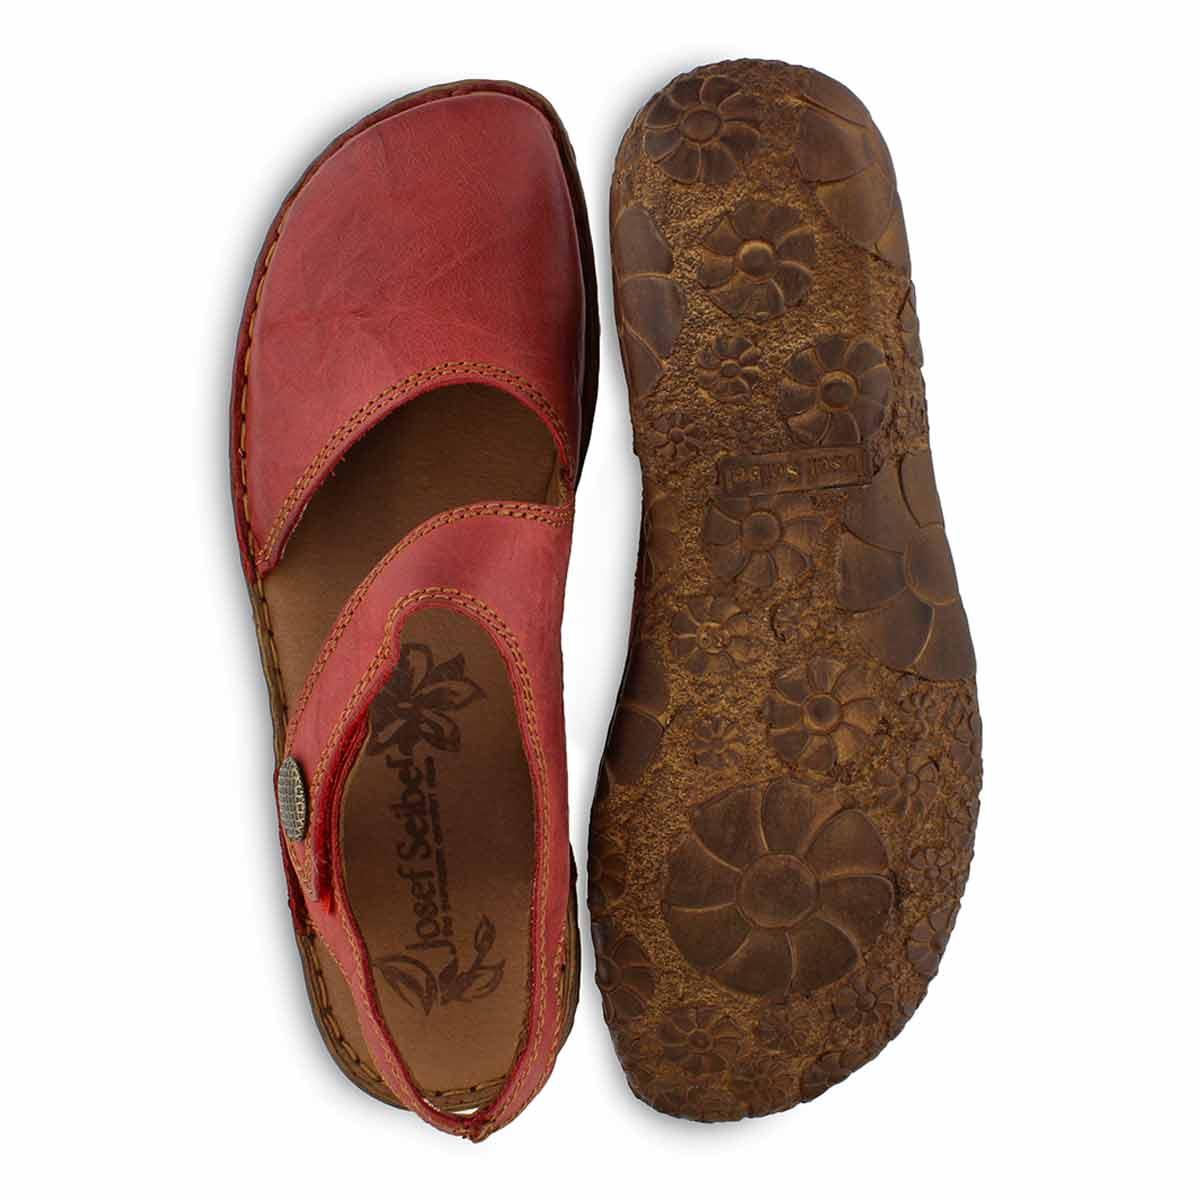 Lds Rosalie 27 hibiscus casual sandal